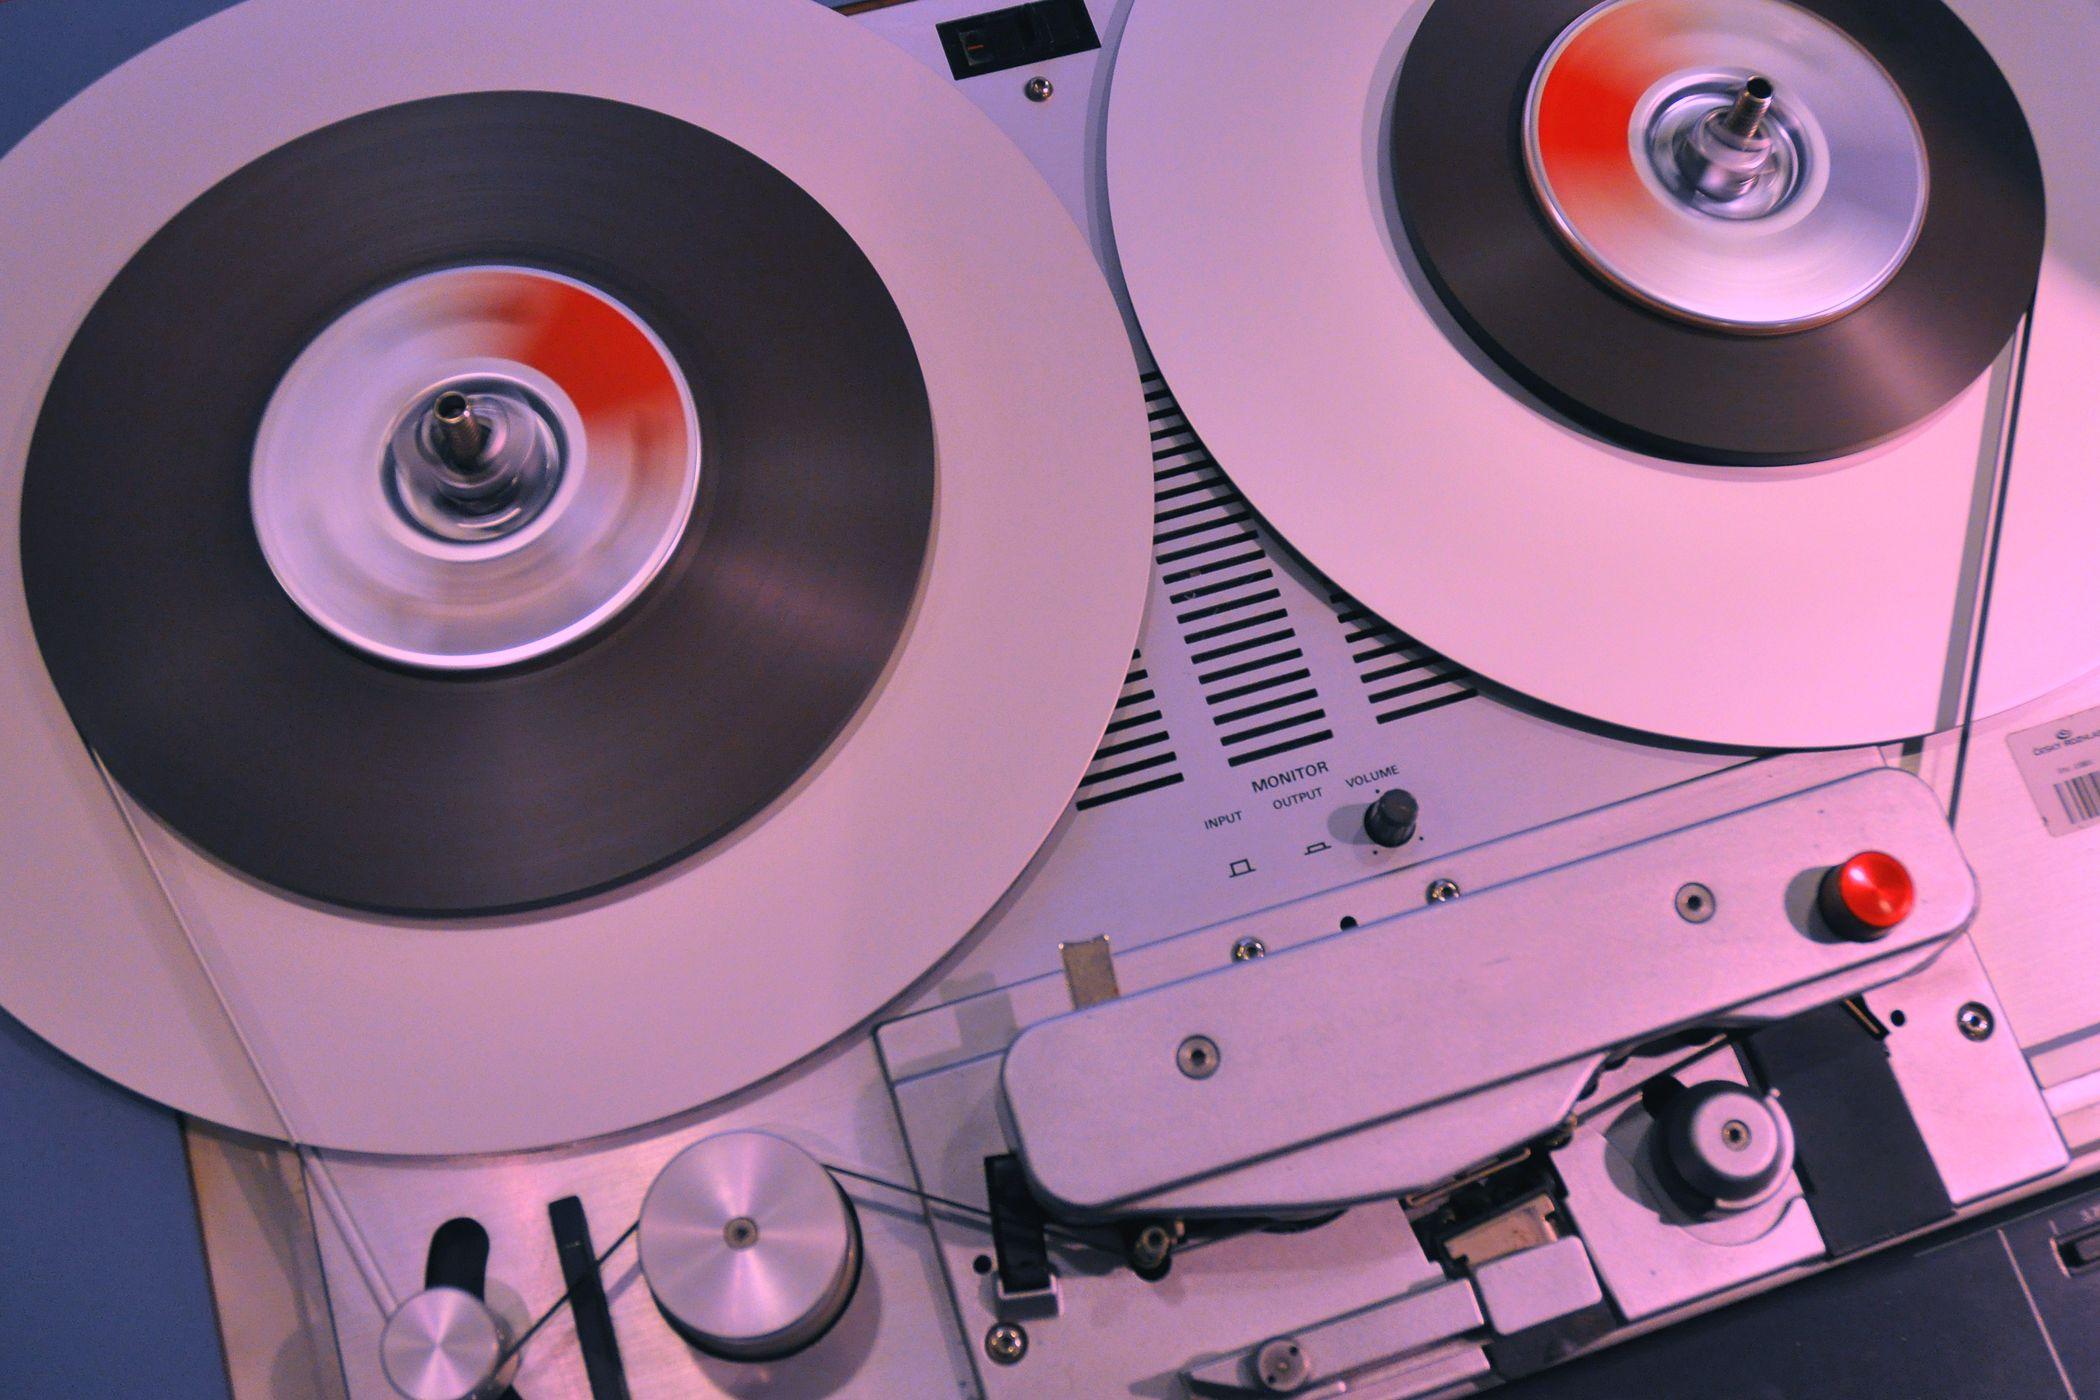 Obrázek skladby